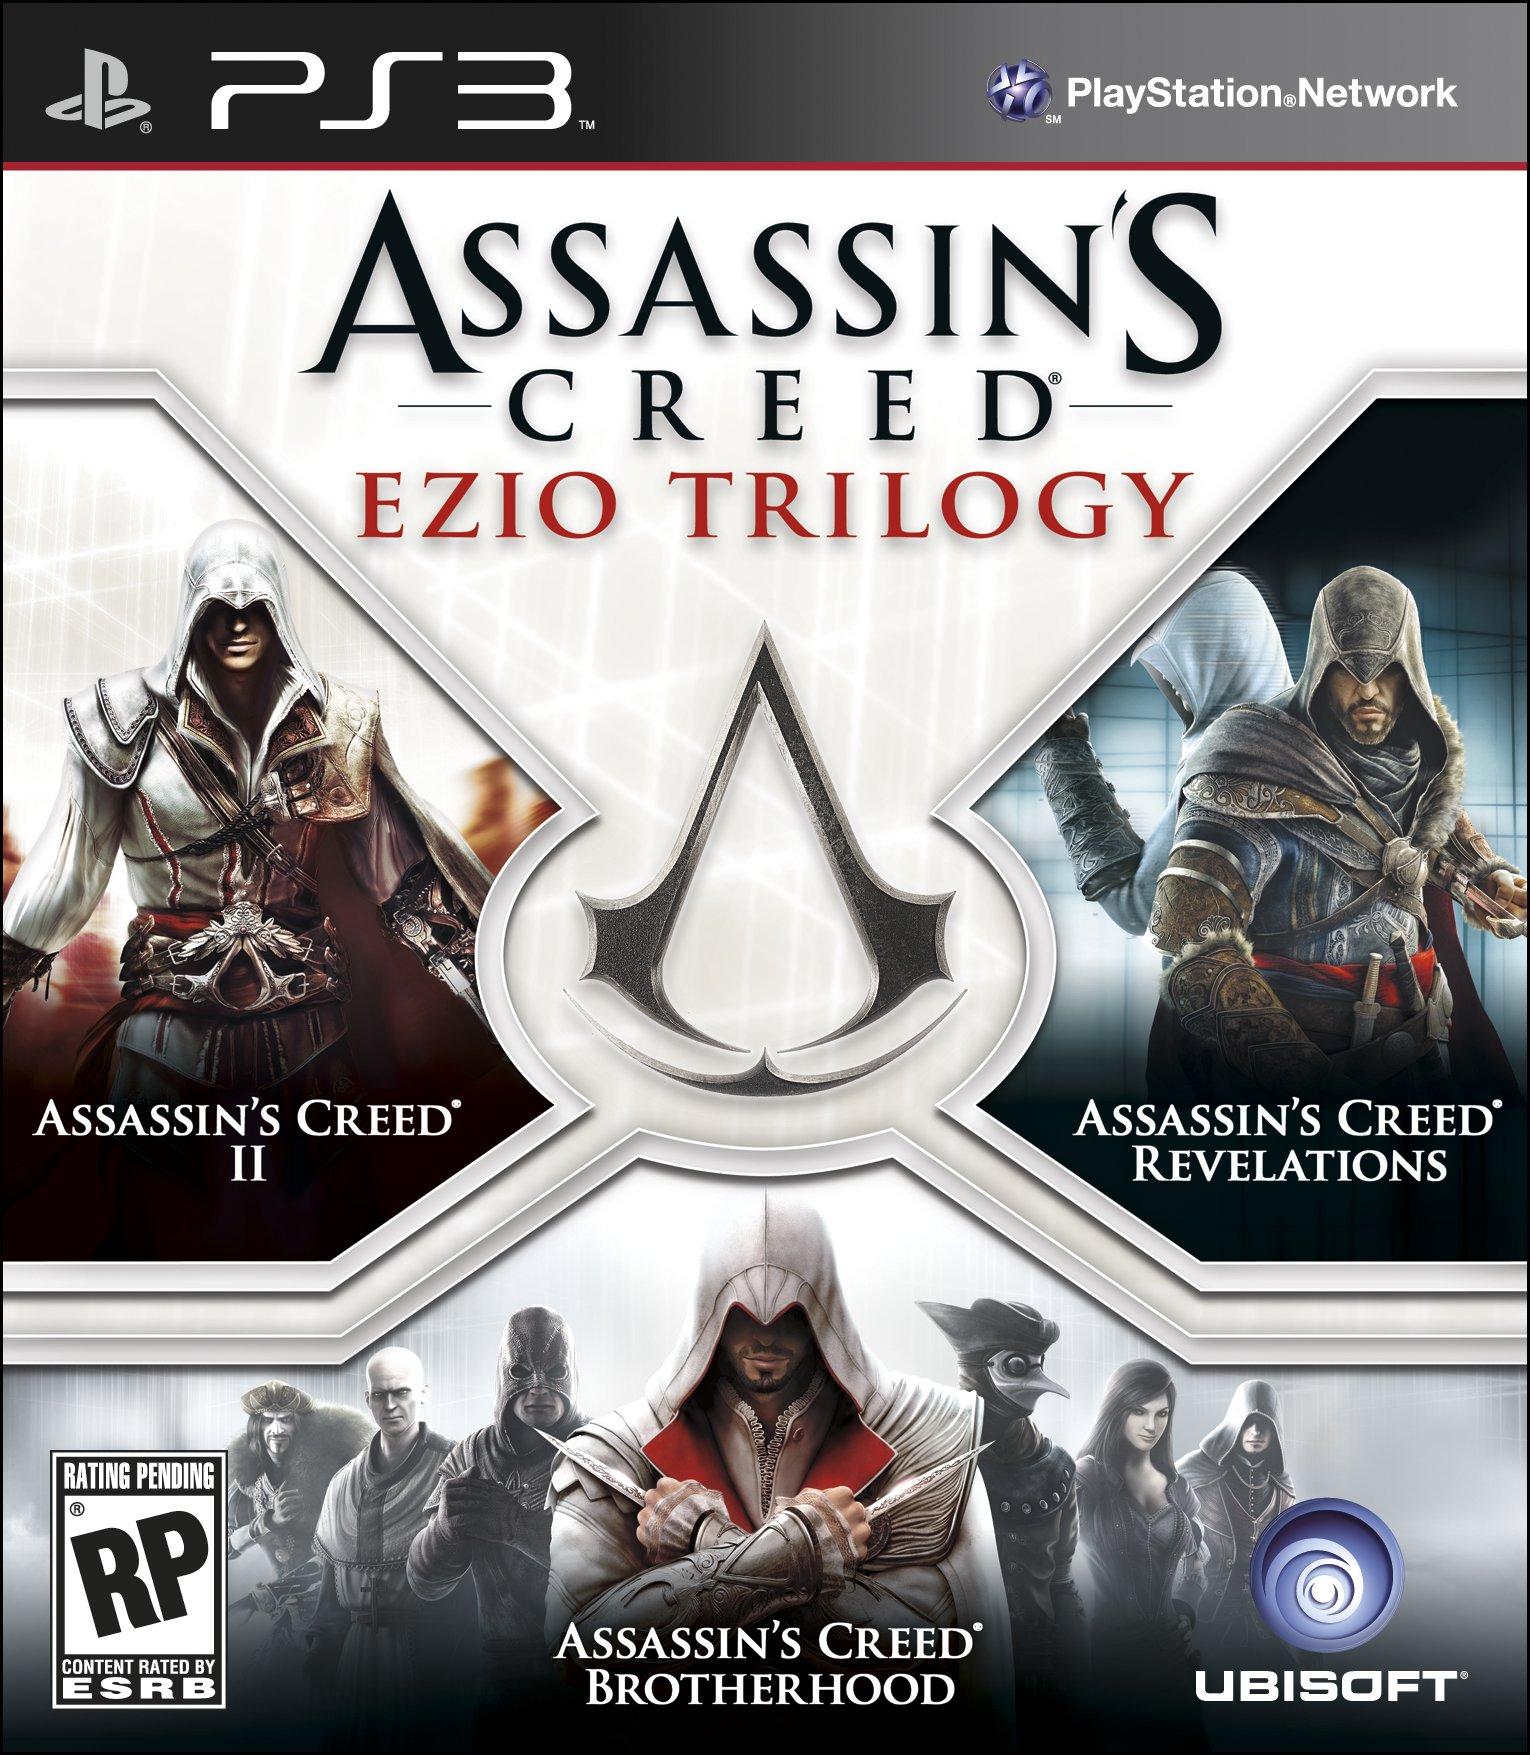 Assassin\'s Creed: Ezio Trilogy announced for PS3 - Gematsu